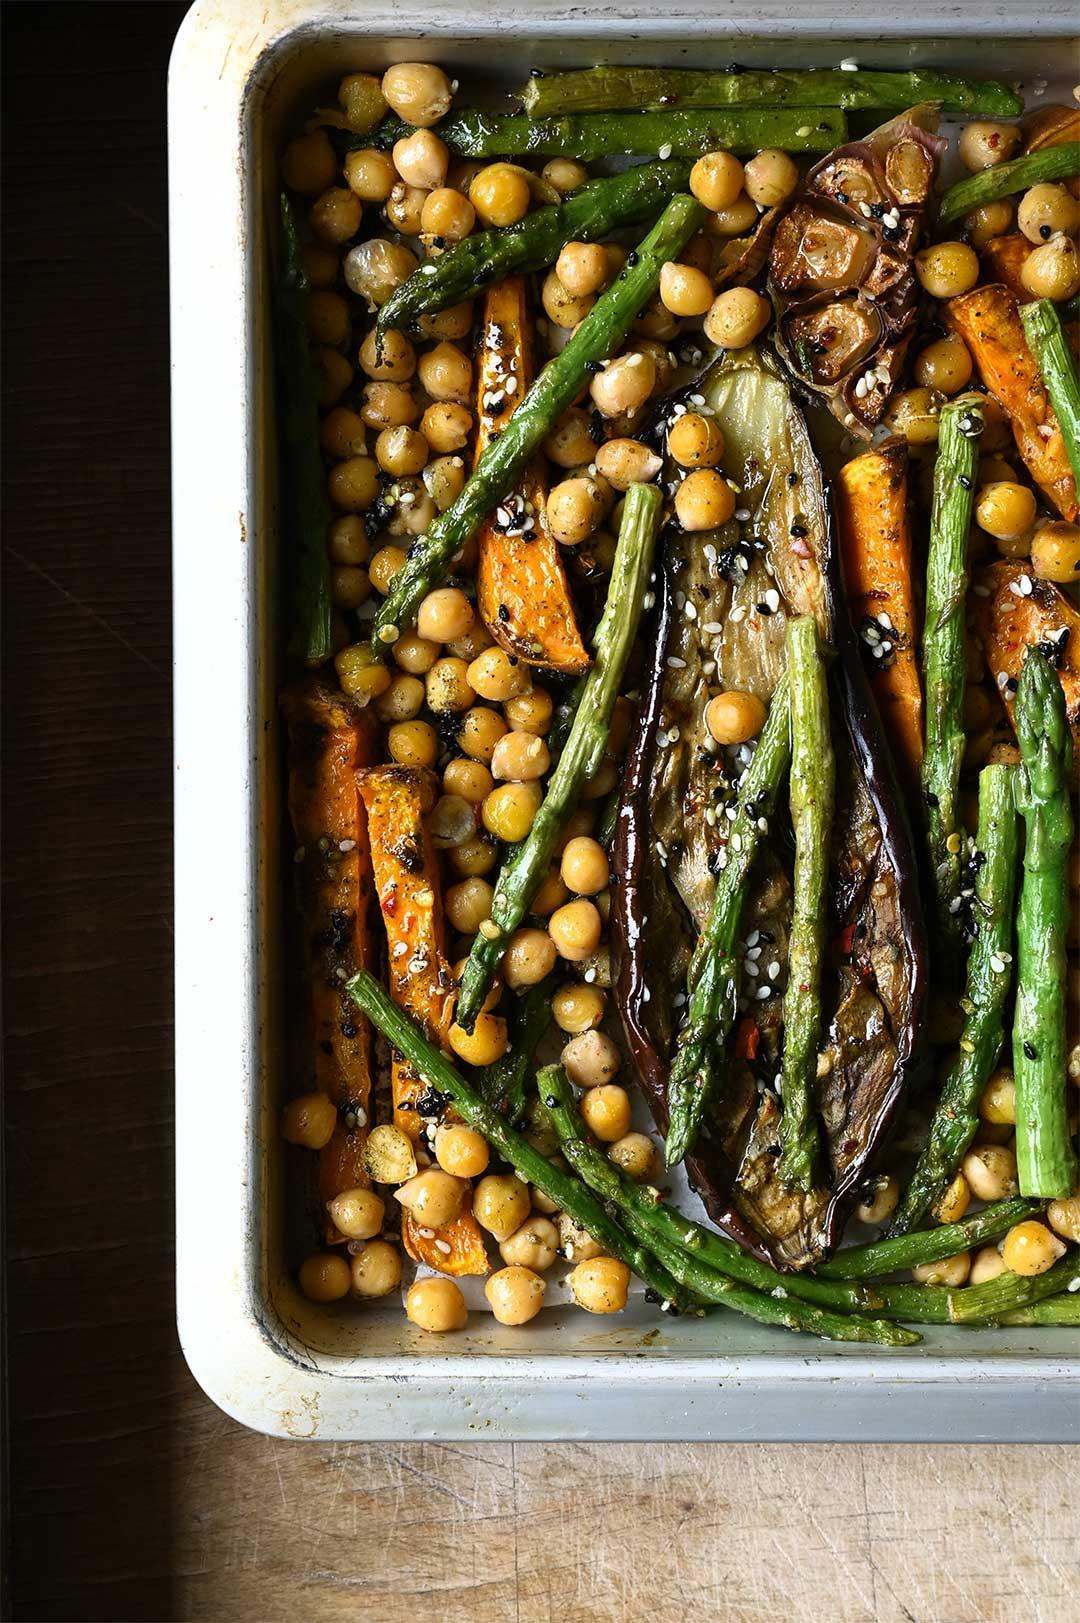 serving dumplings | Hummus bowl with roasted vegetables & za'atar oil